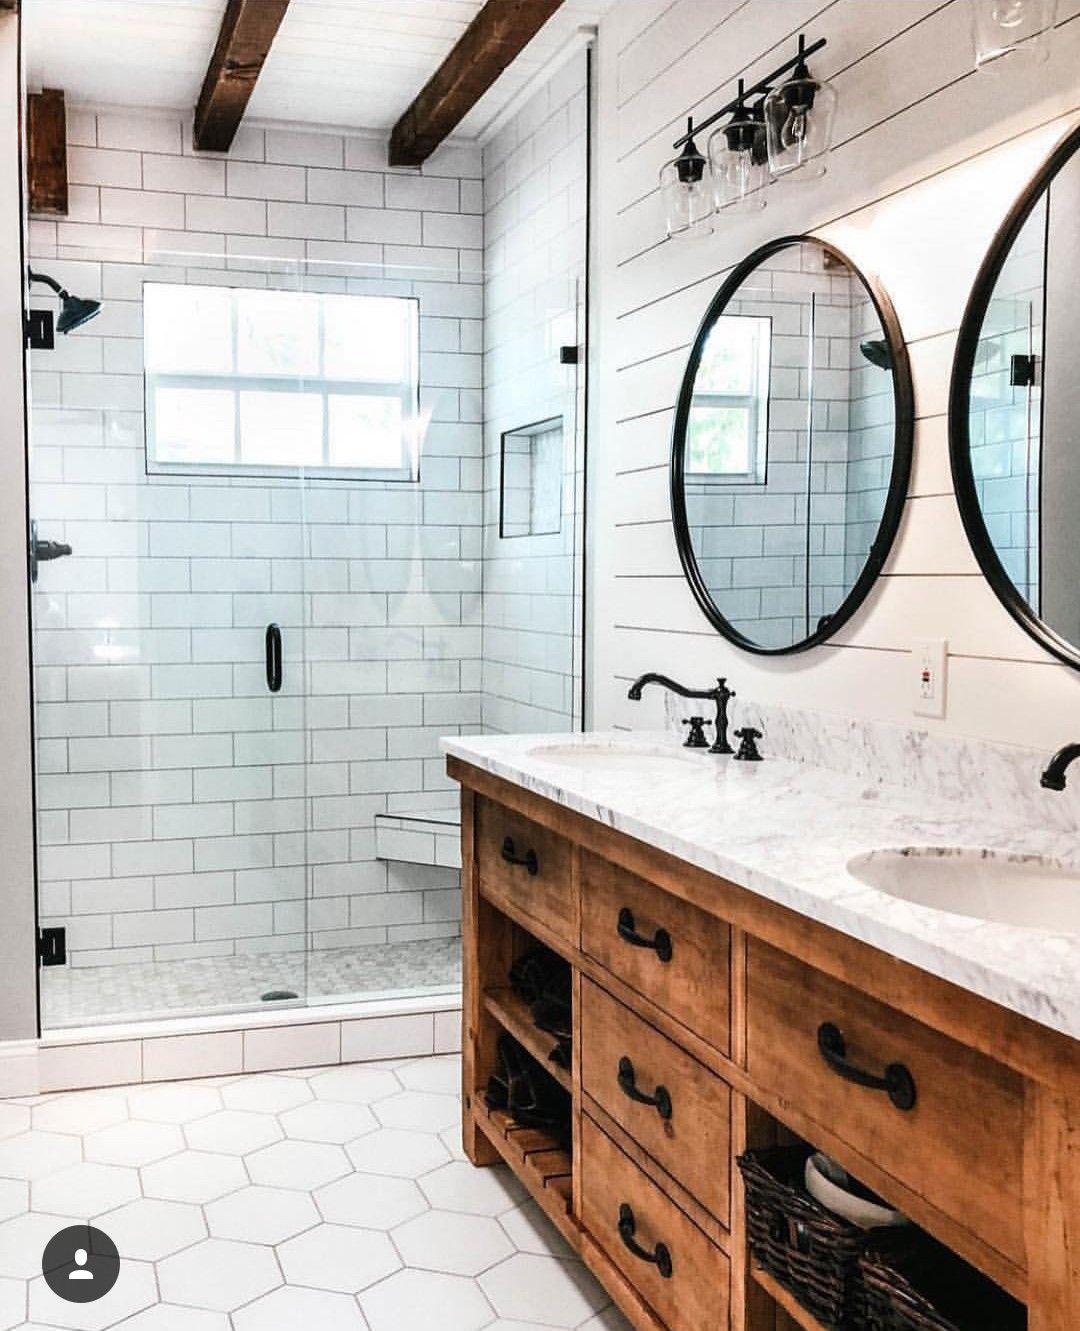 Modern Farmhouse Bathroom. White tile and shiplap with wood